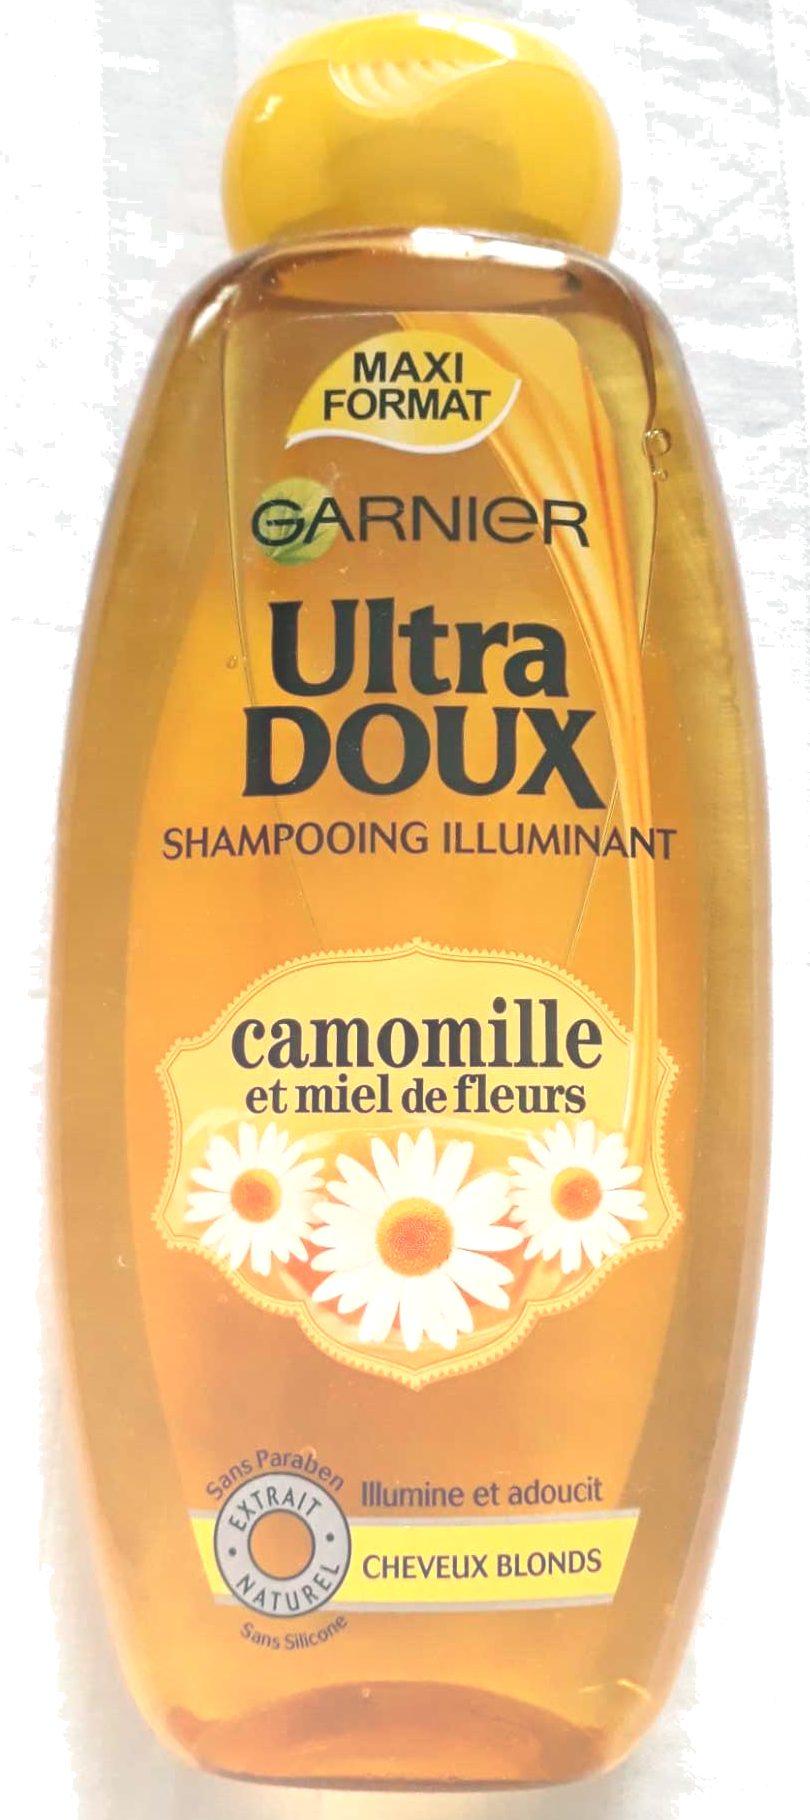 Ultra doux shampooing illuminant - Product - fr